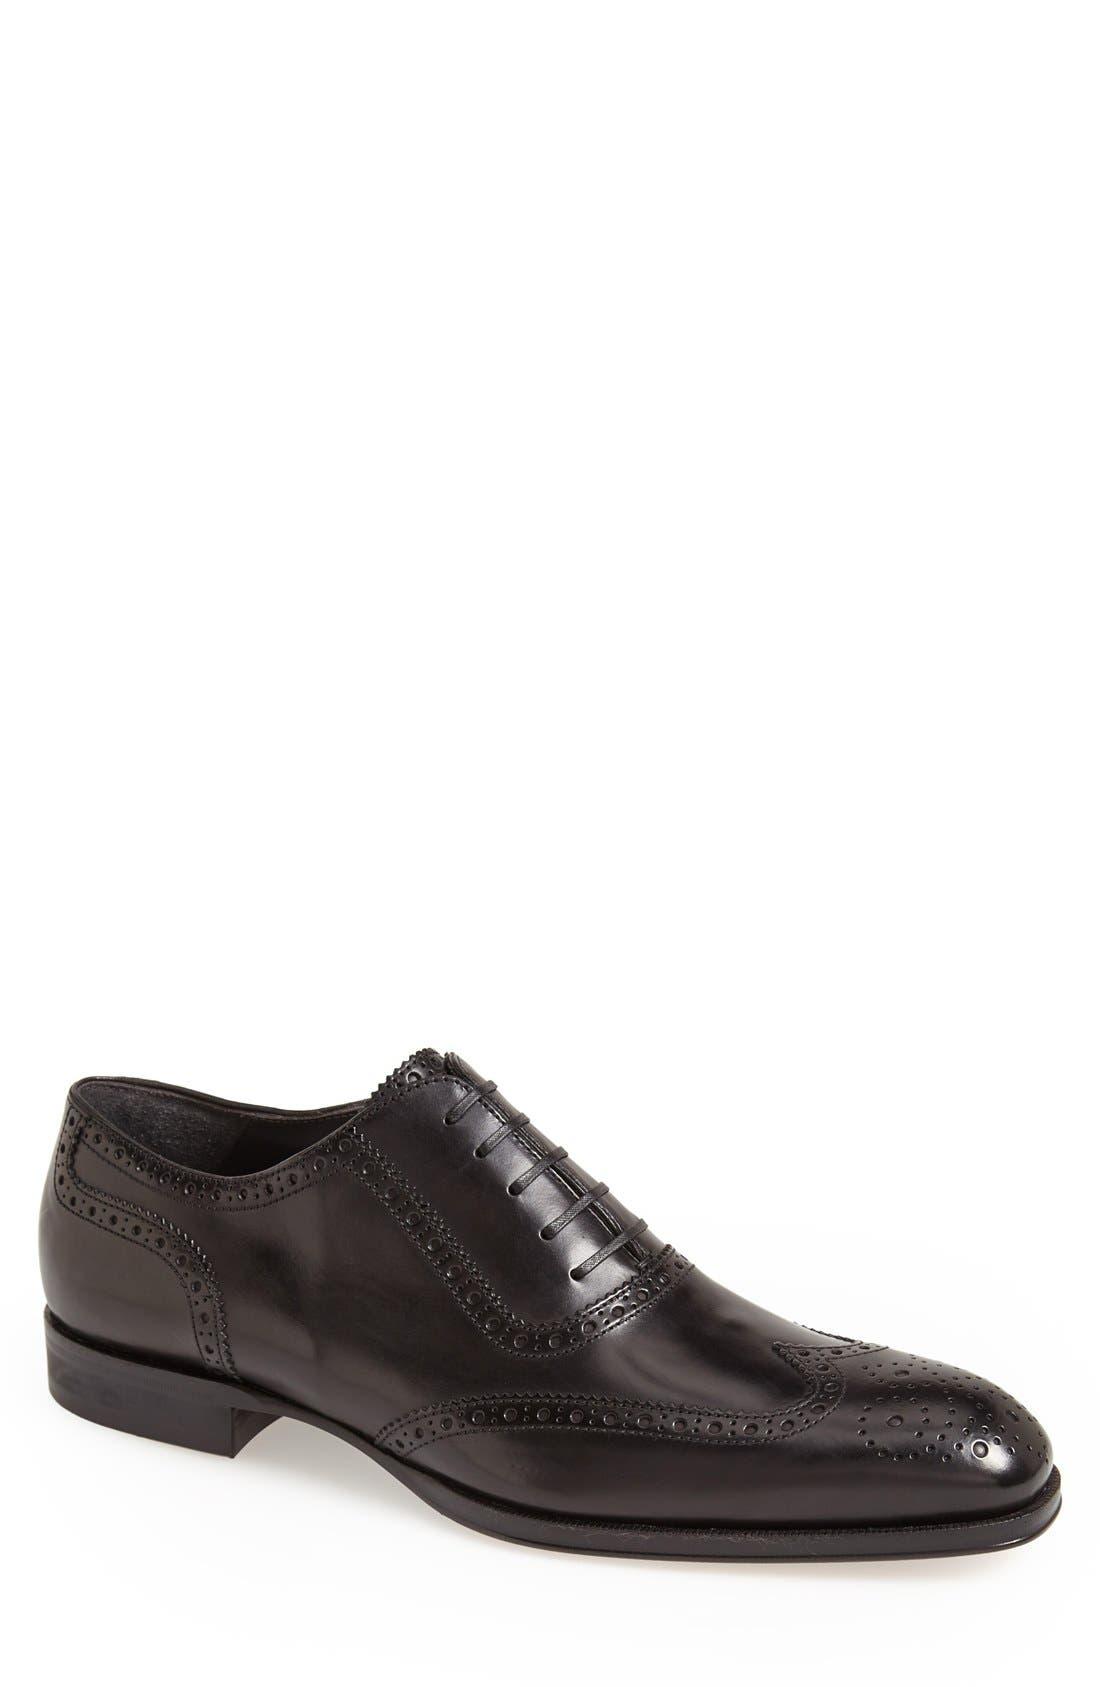 'Duke' Wingtip,                         Main,                         color, Black Leather